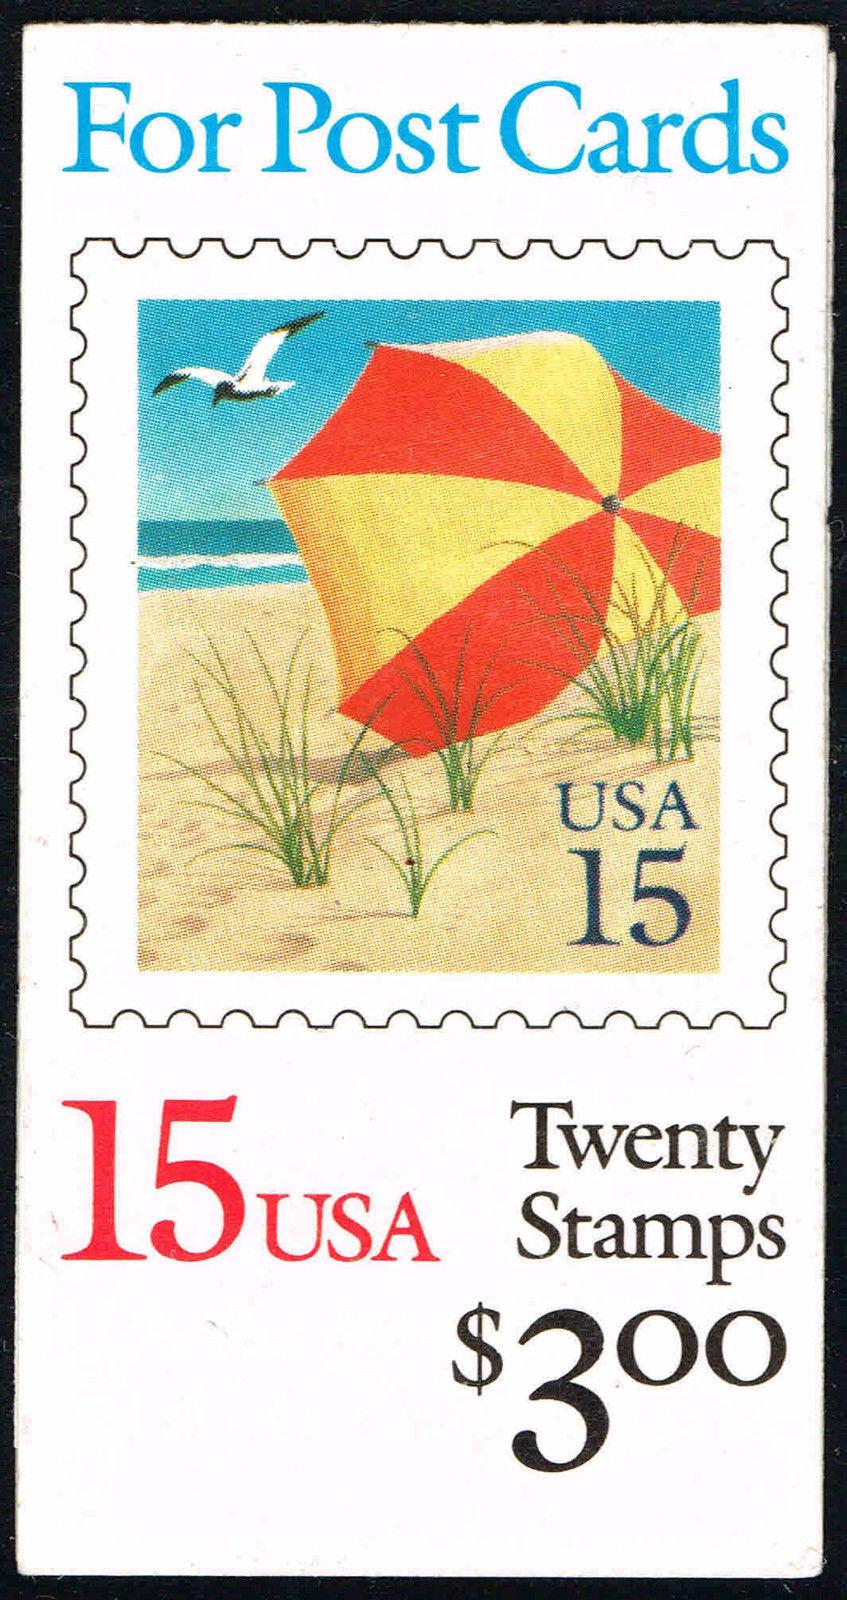 1990 15c Beach Umbrella, Booklet of 20 Scott 2443 Mint